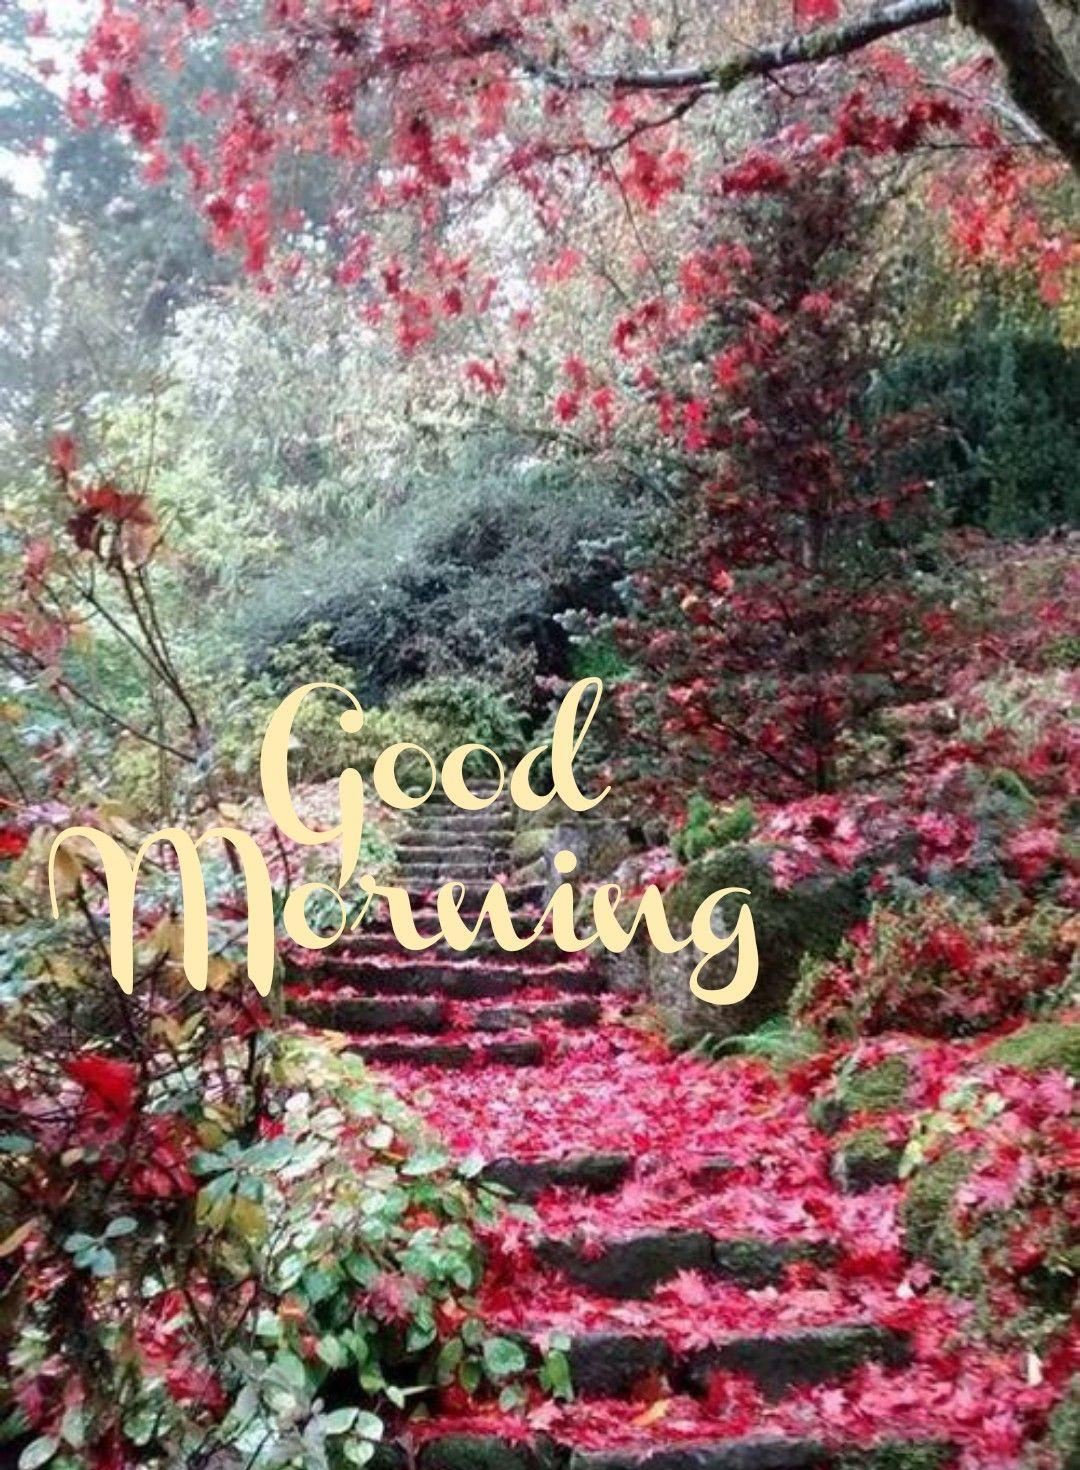 Good Morning Greetings Good Morning Nature Good Morning Greetings Good Morning Flowers